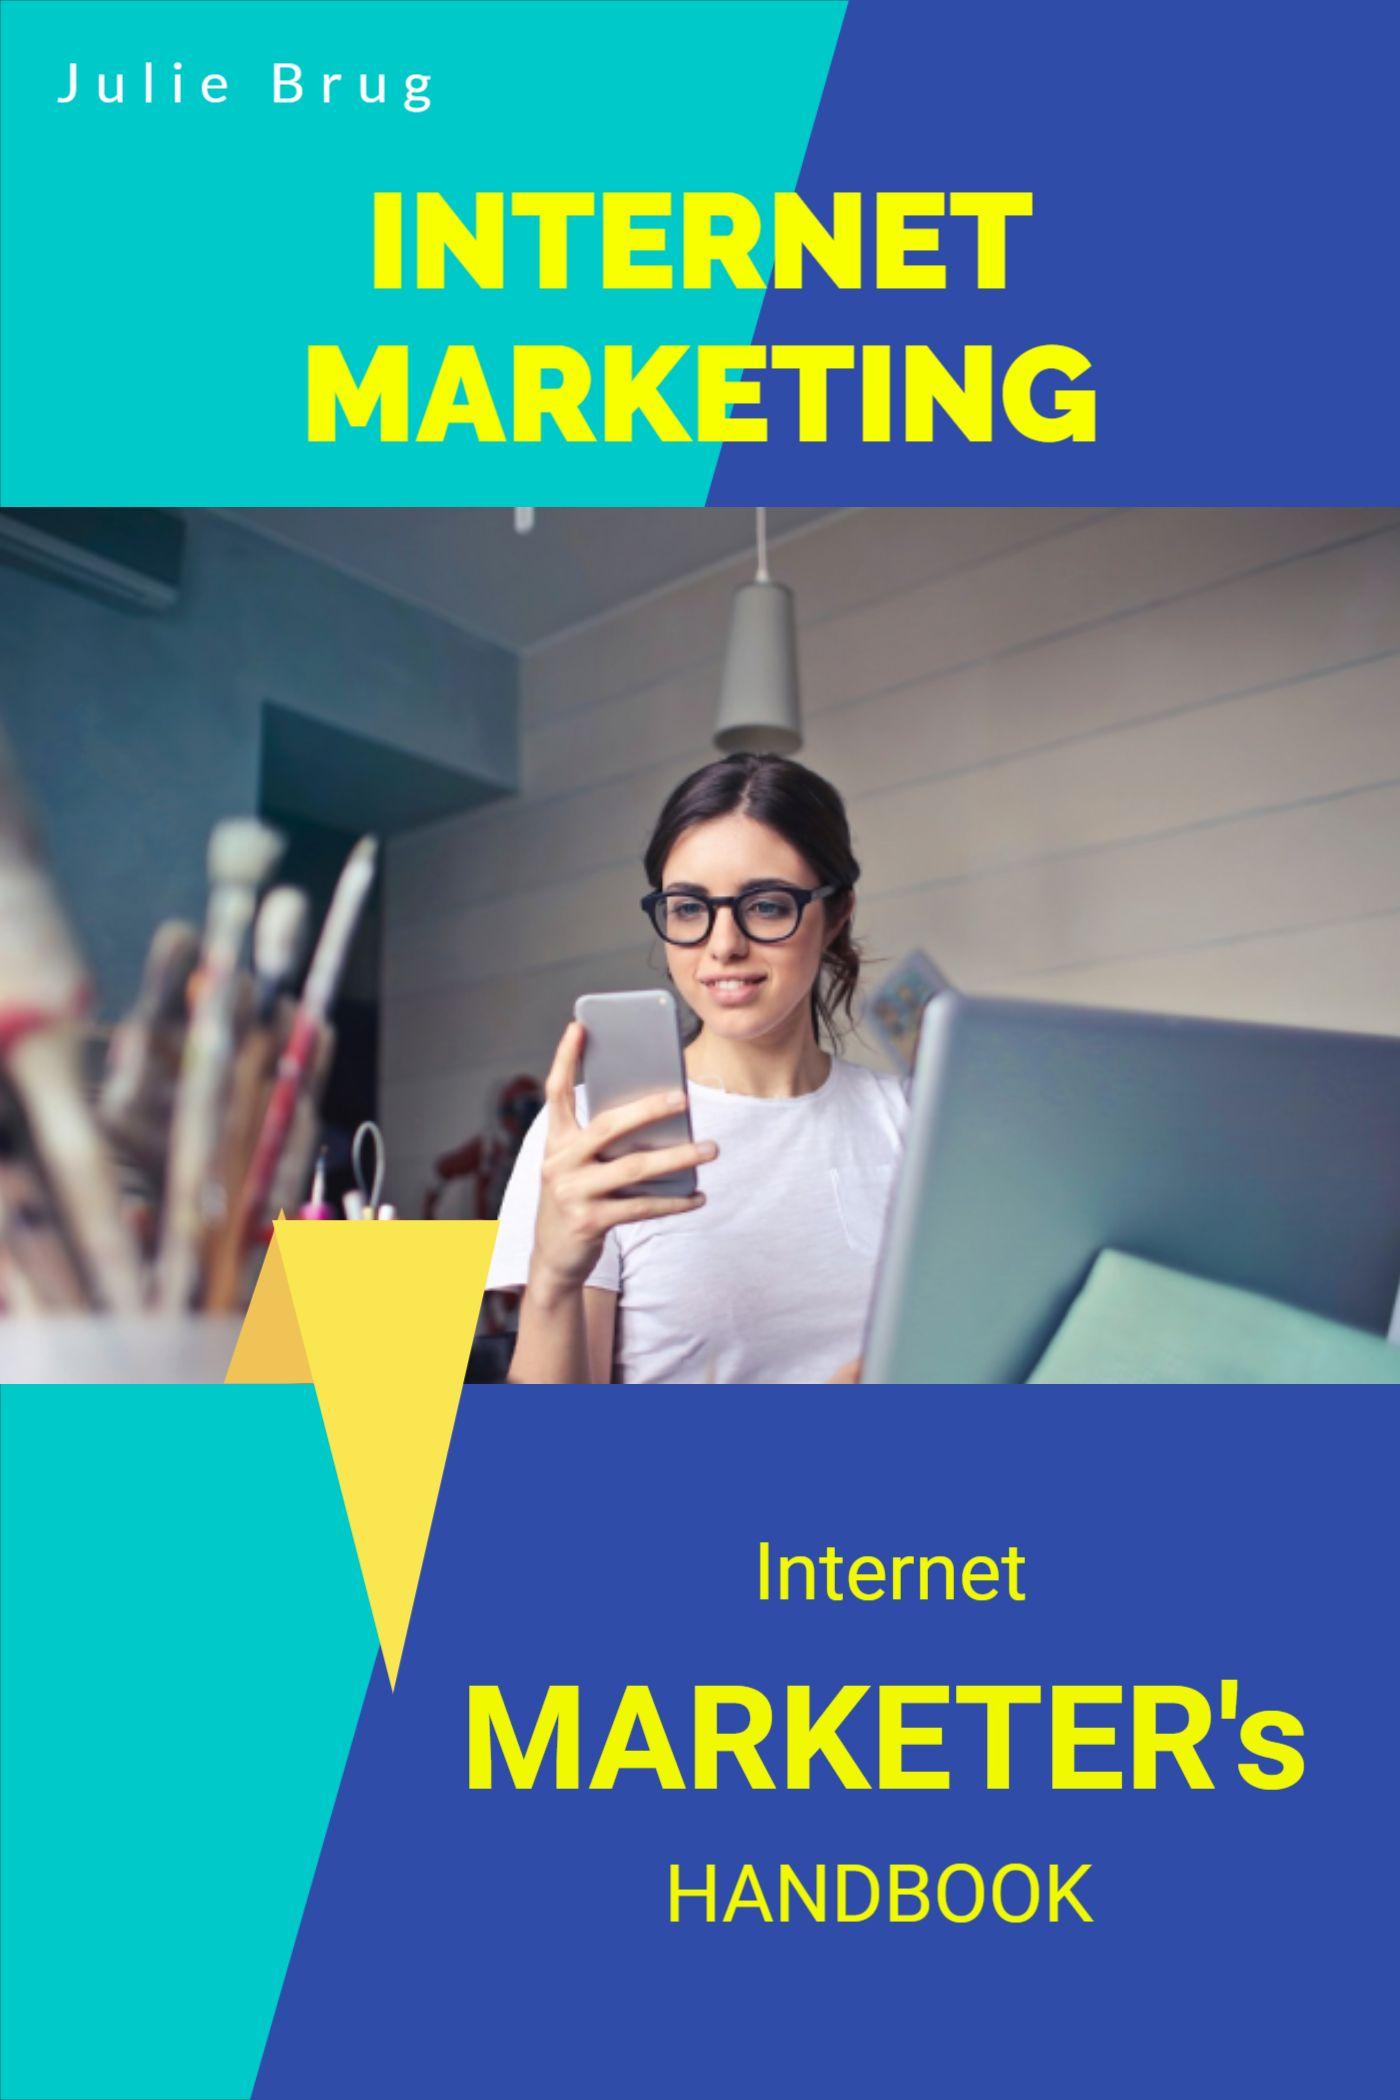 Internet Marketing Book Cover Template